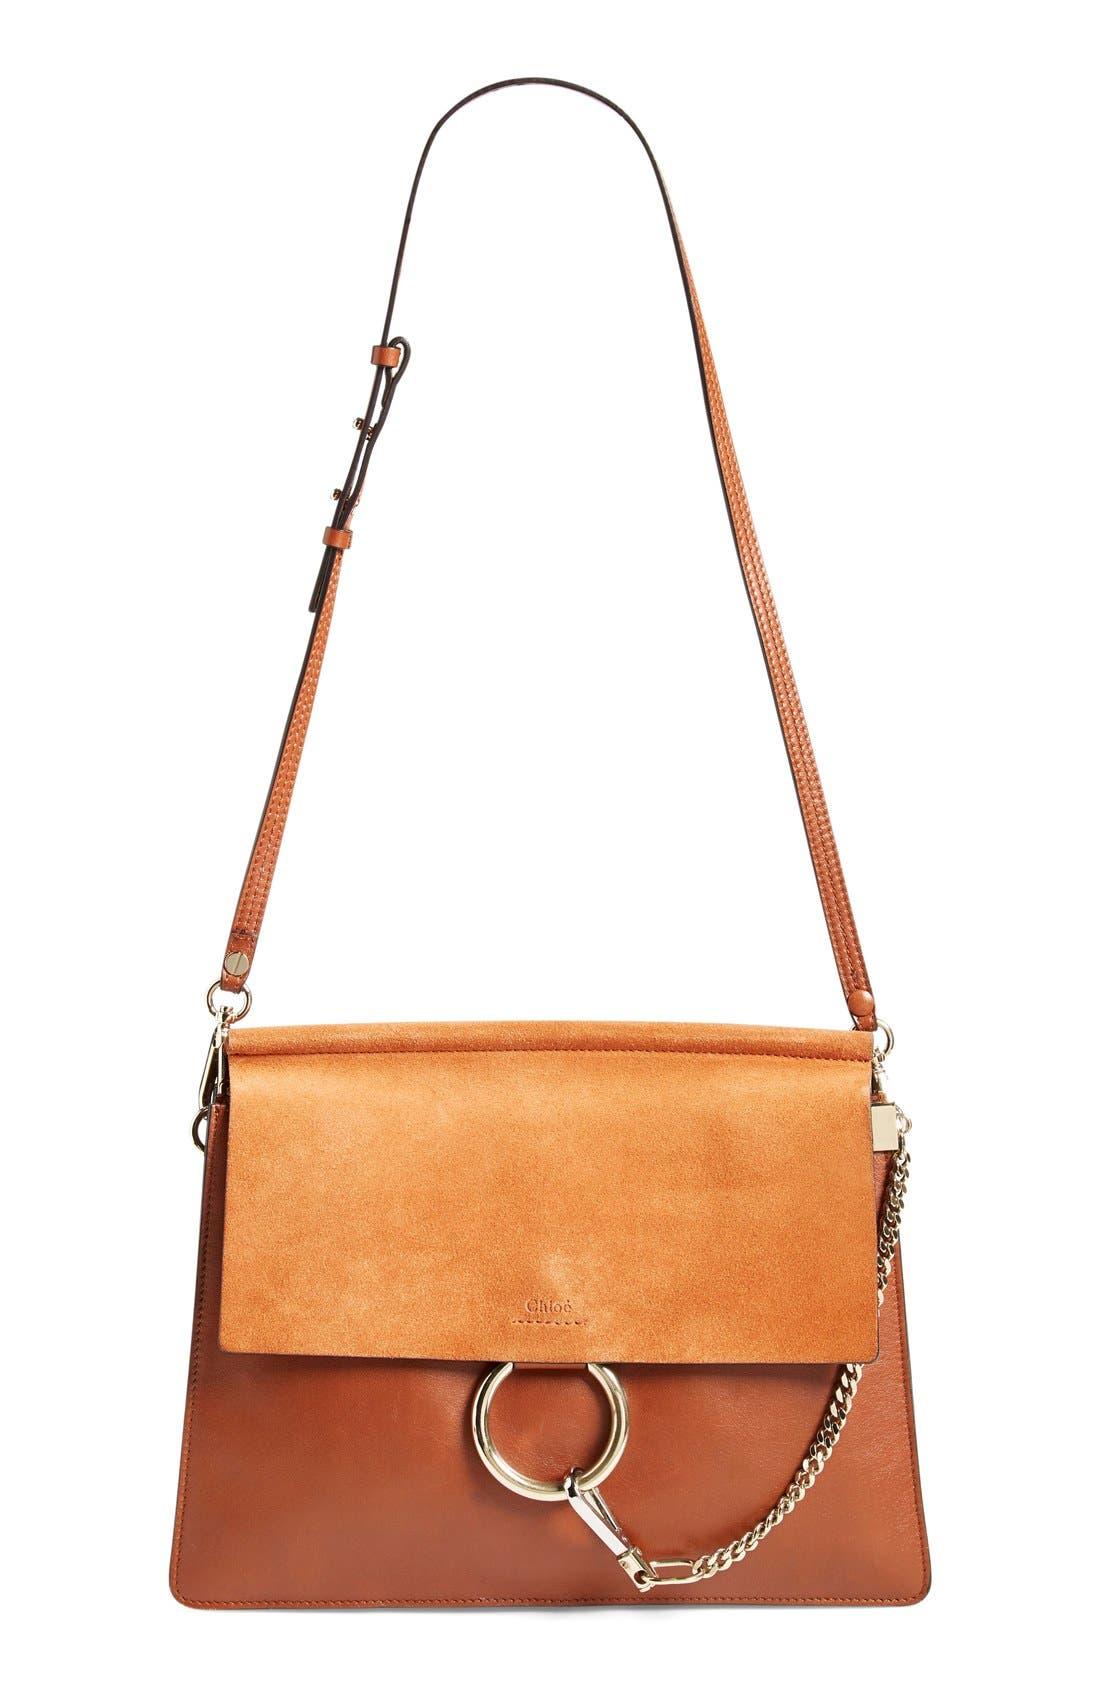 Main Image - Chloé 'Faye' Leather & Suede Shoulder Bag